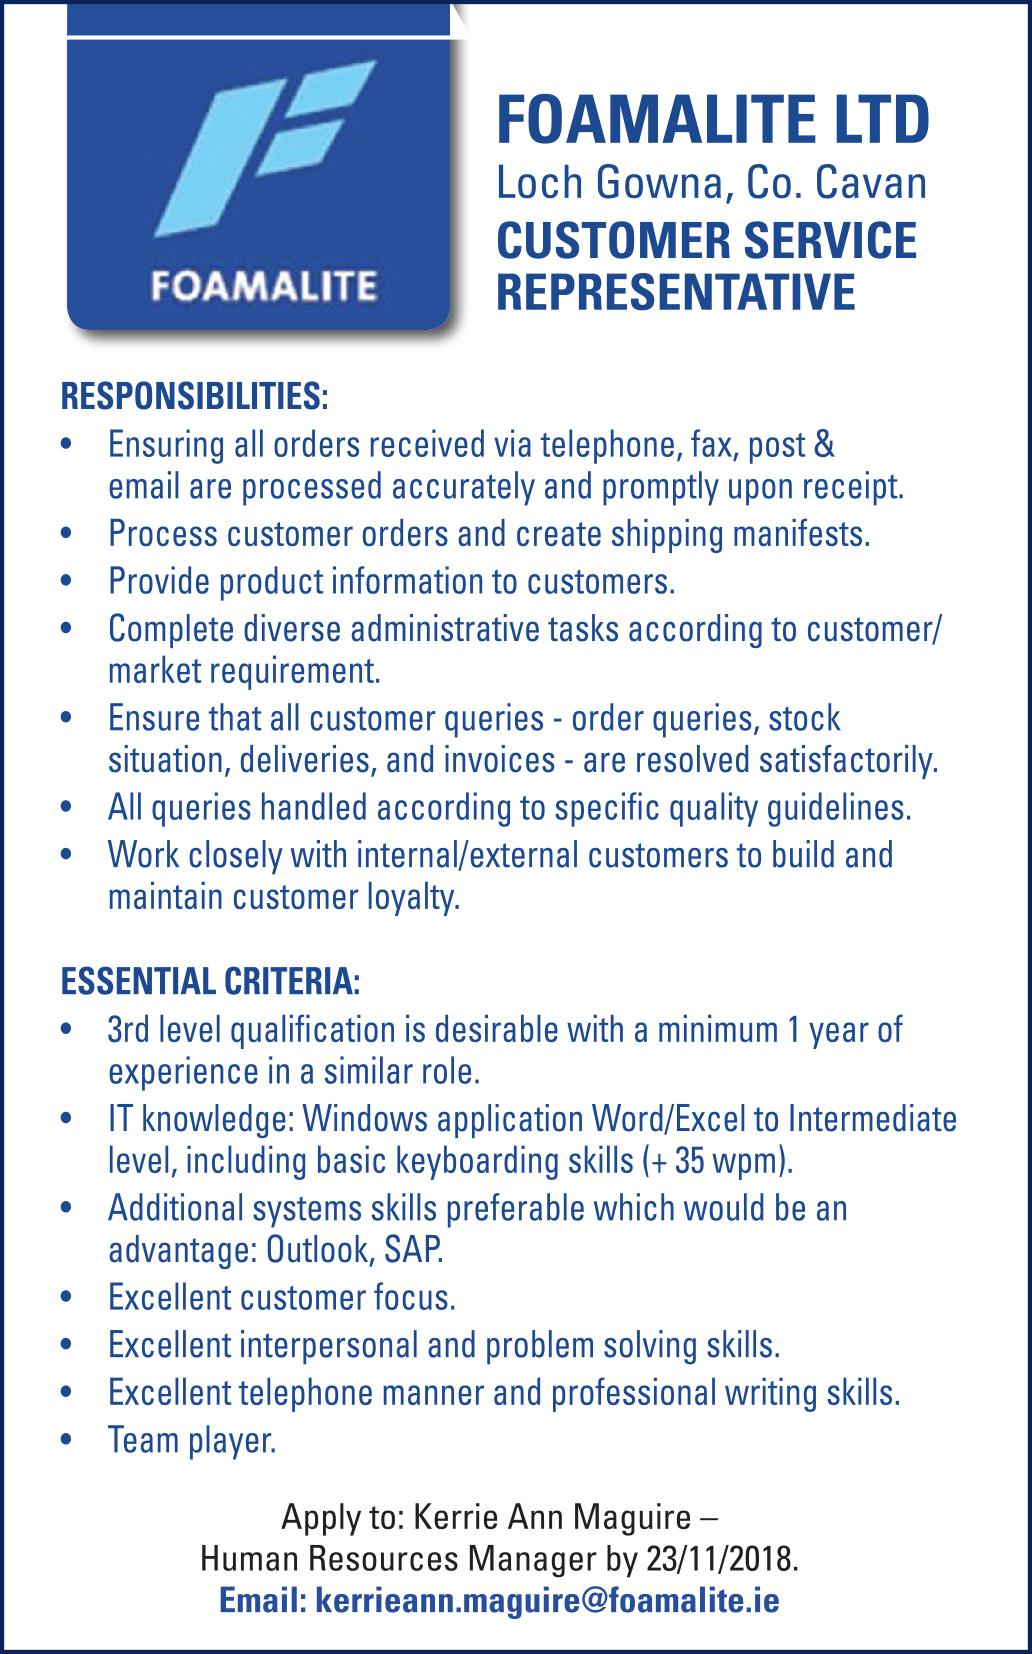 qualifications for a customer service representative